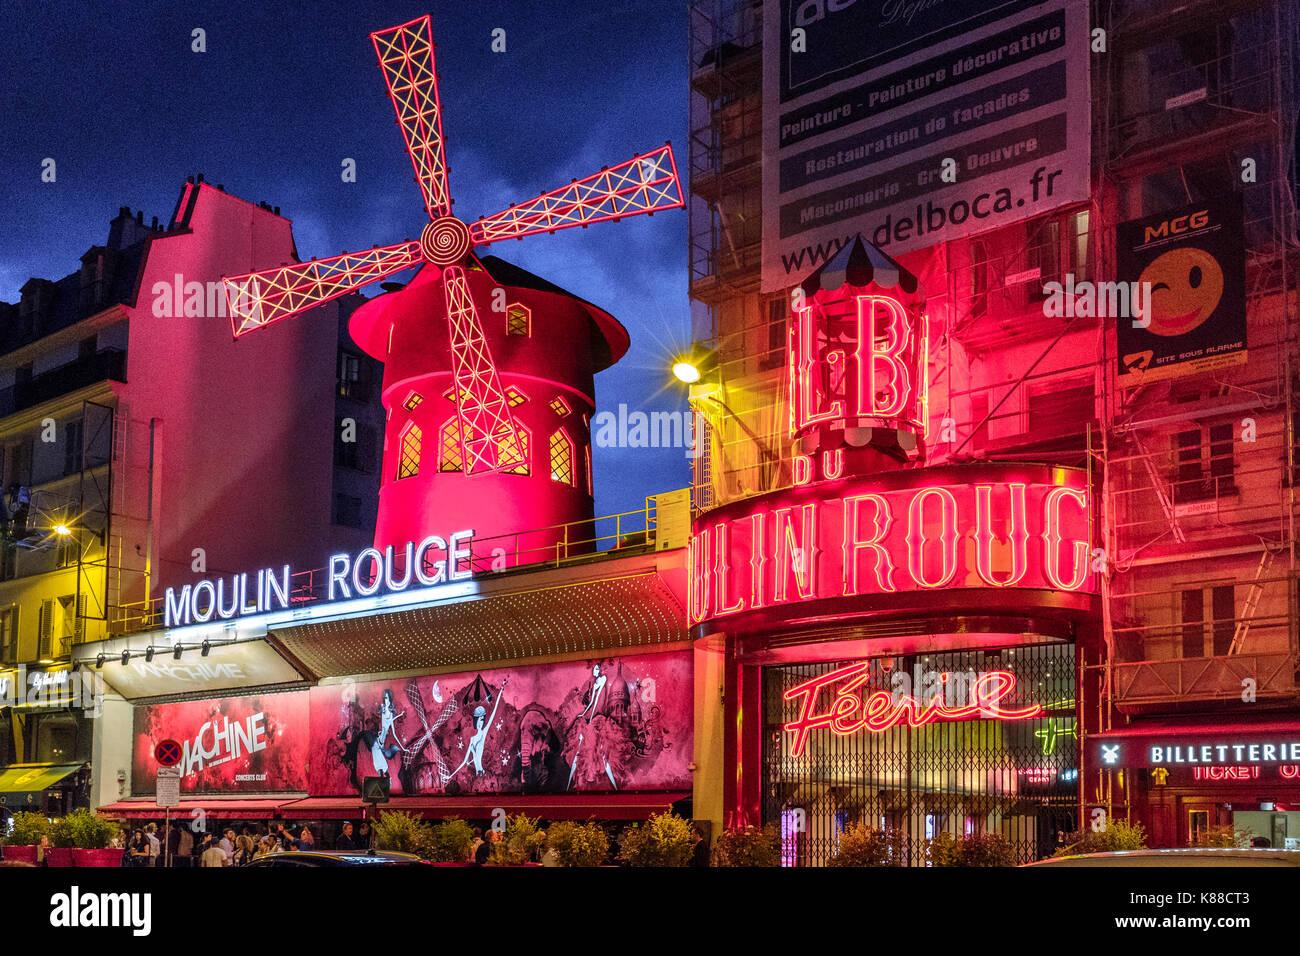 Moulin Rouge bei Nacht, Paris, Frankreich Stockbild